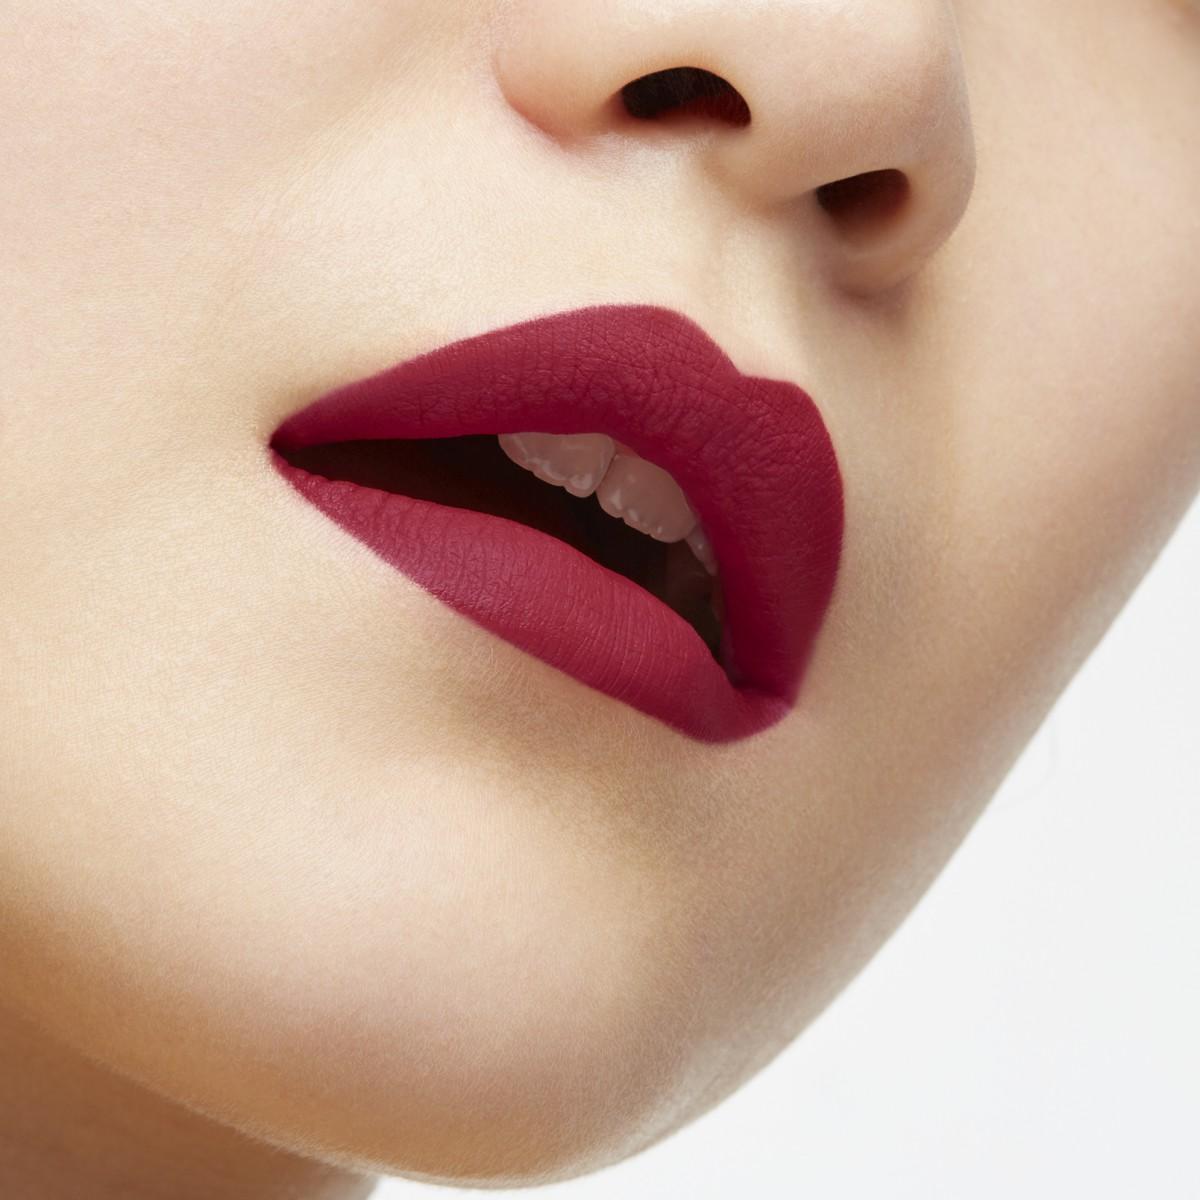 Woman Beauty - リップカラー スュールヴィヴィタ 420m - Christian Louboutin